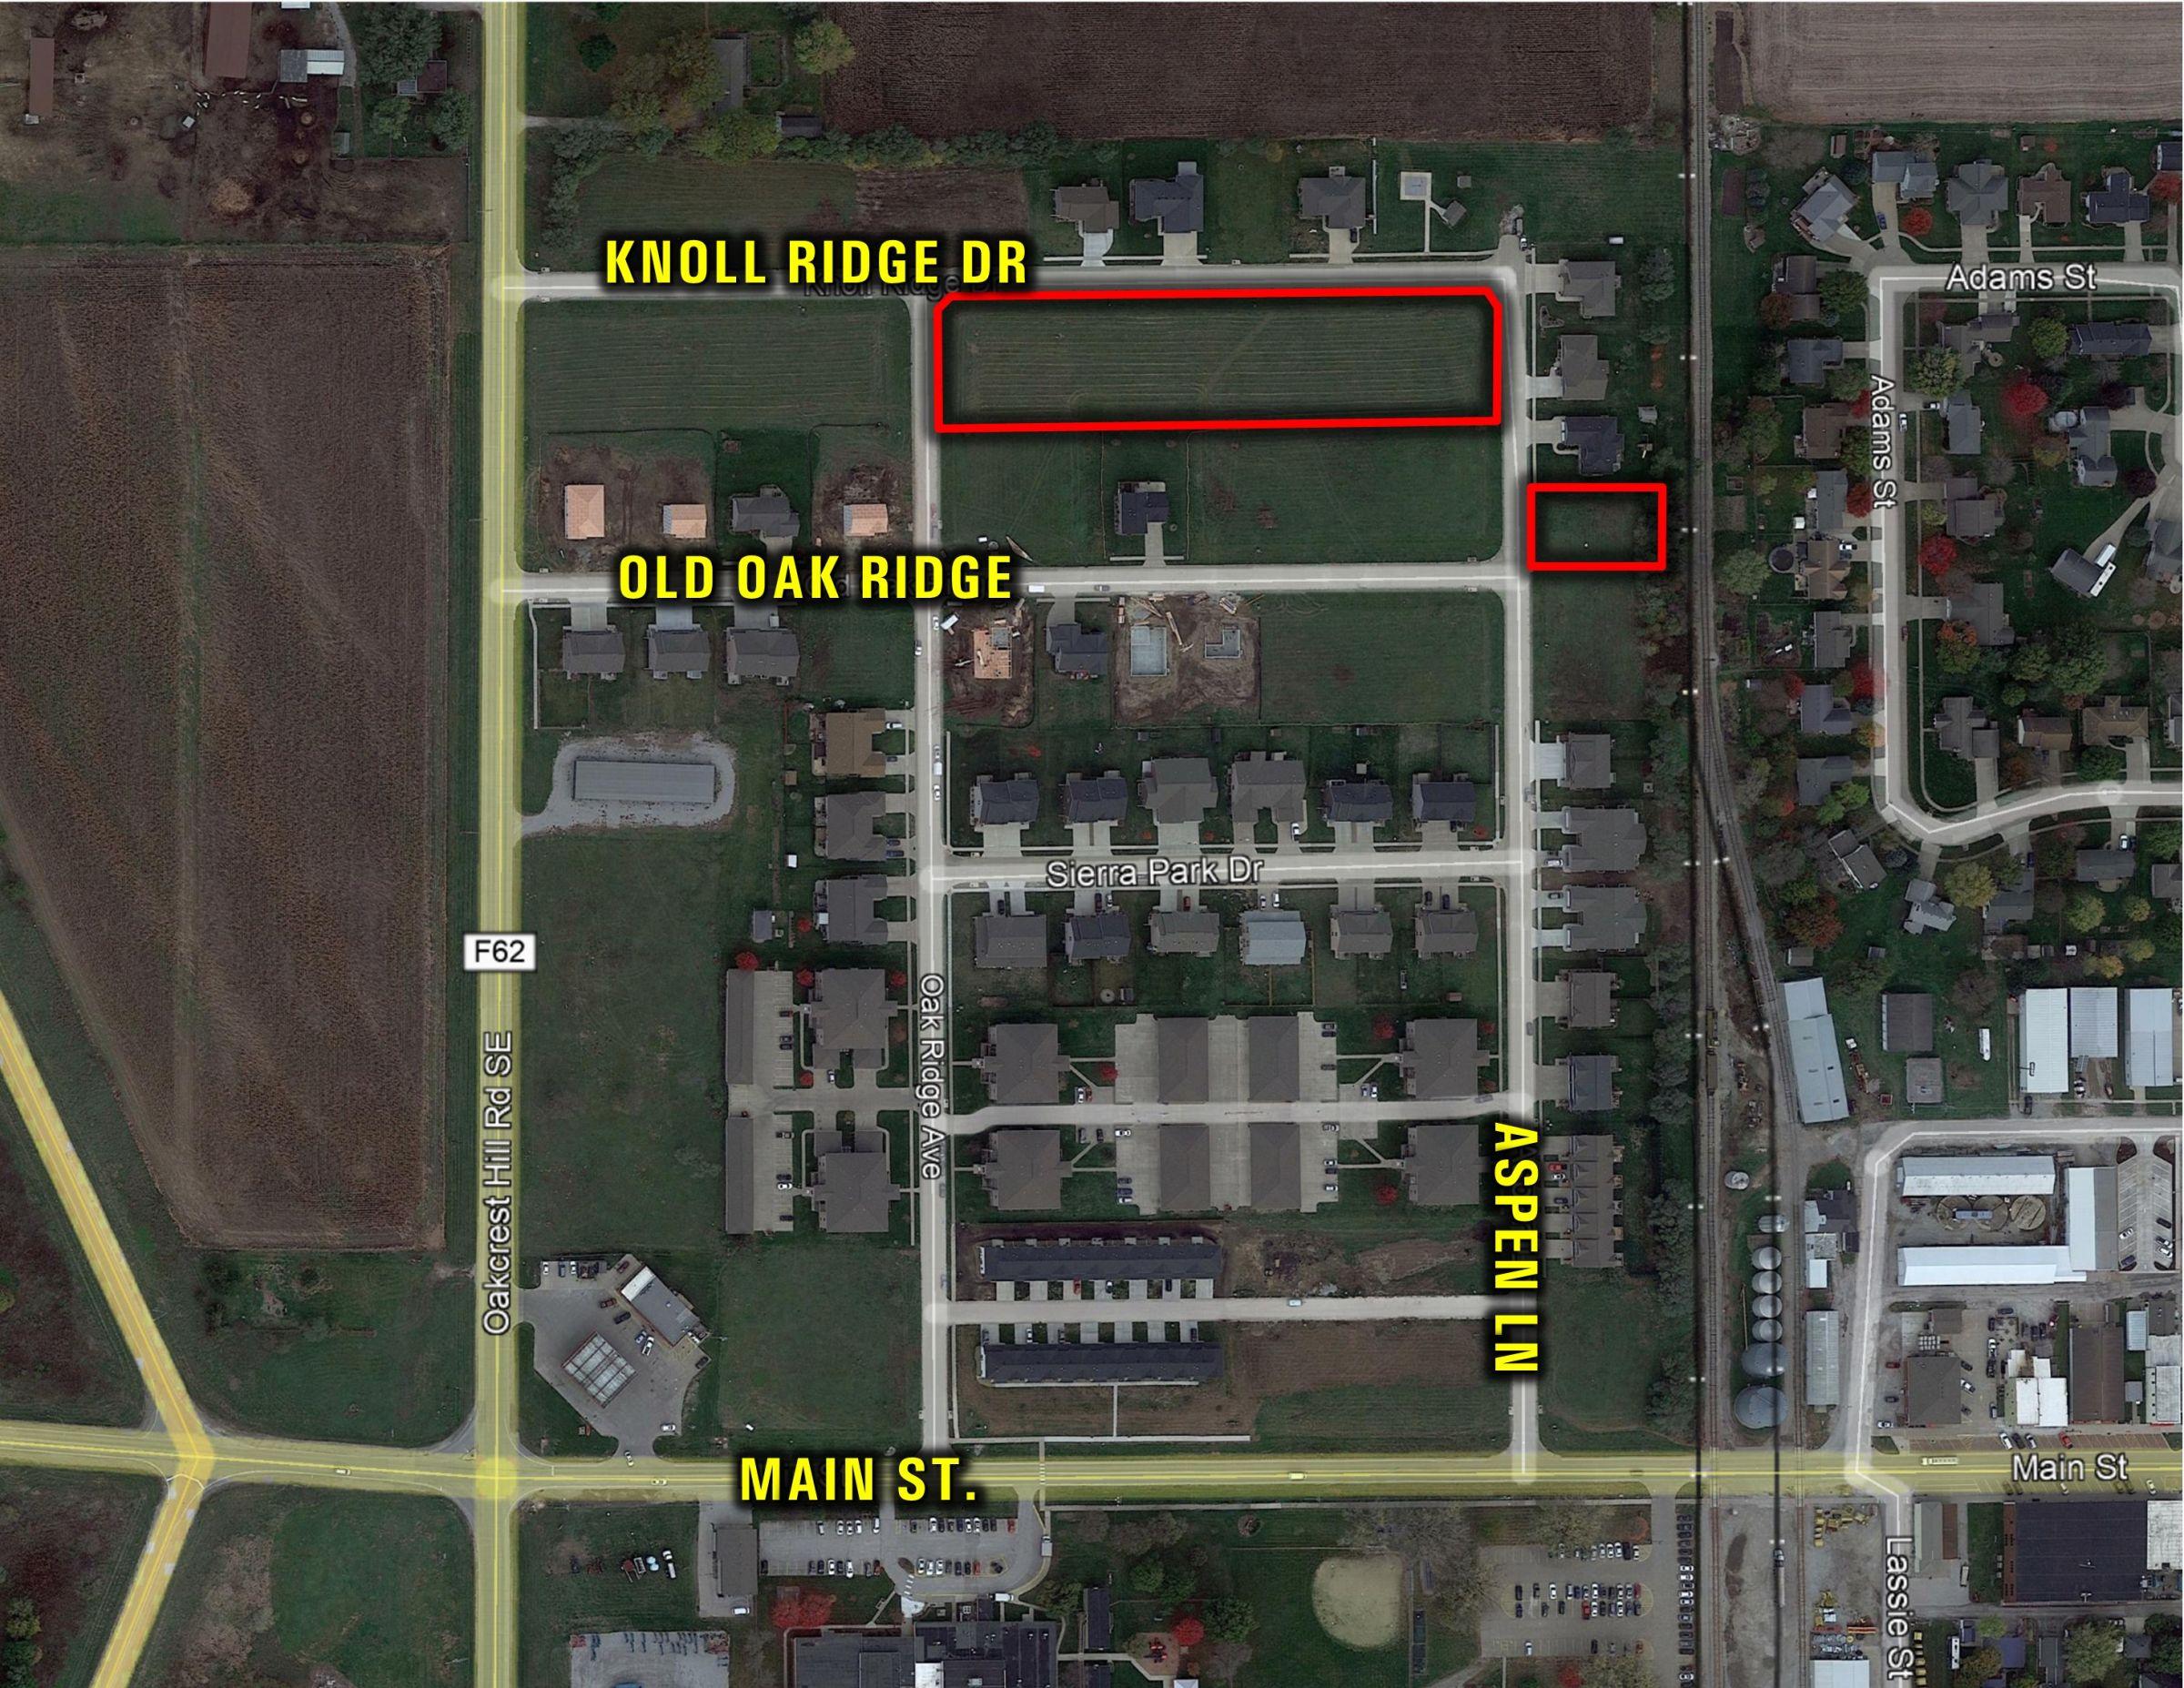 development-land-johnson-county-iowa-0-acres-listing-number-15760-13-2021-09-21-193120.jpg